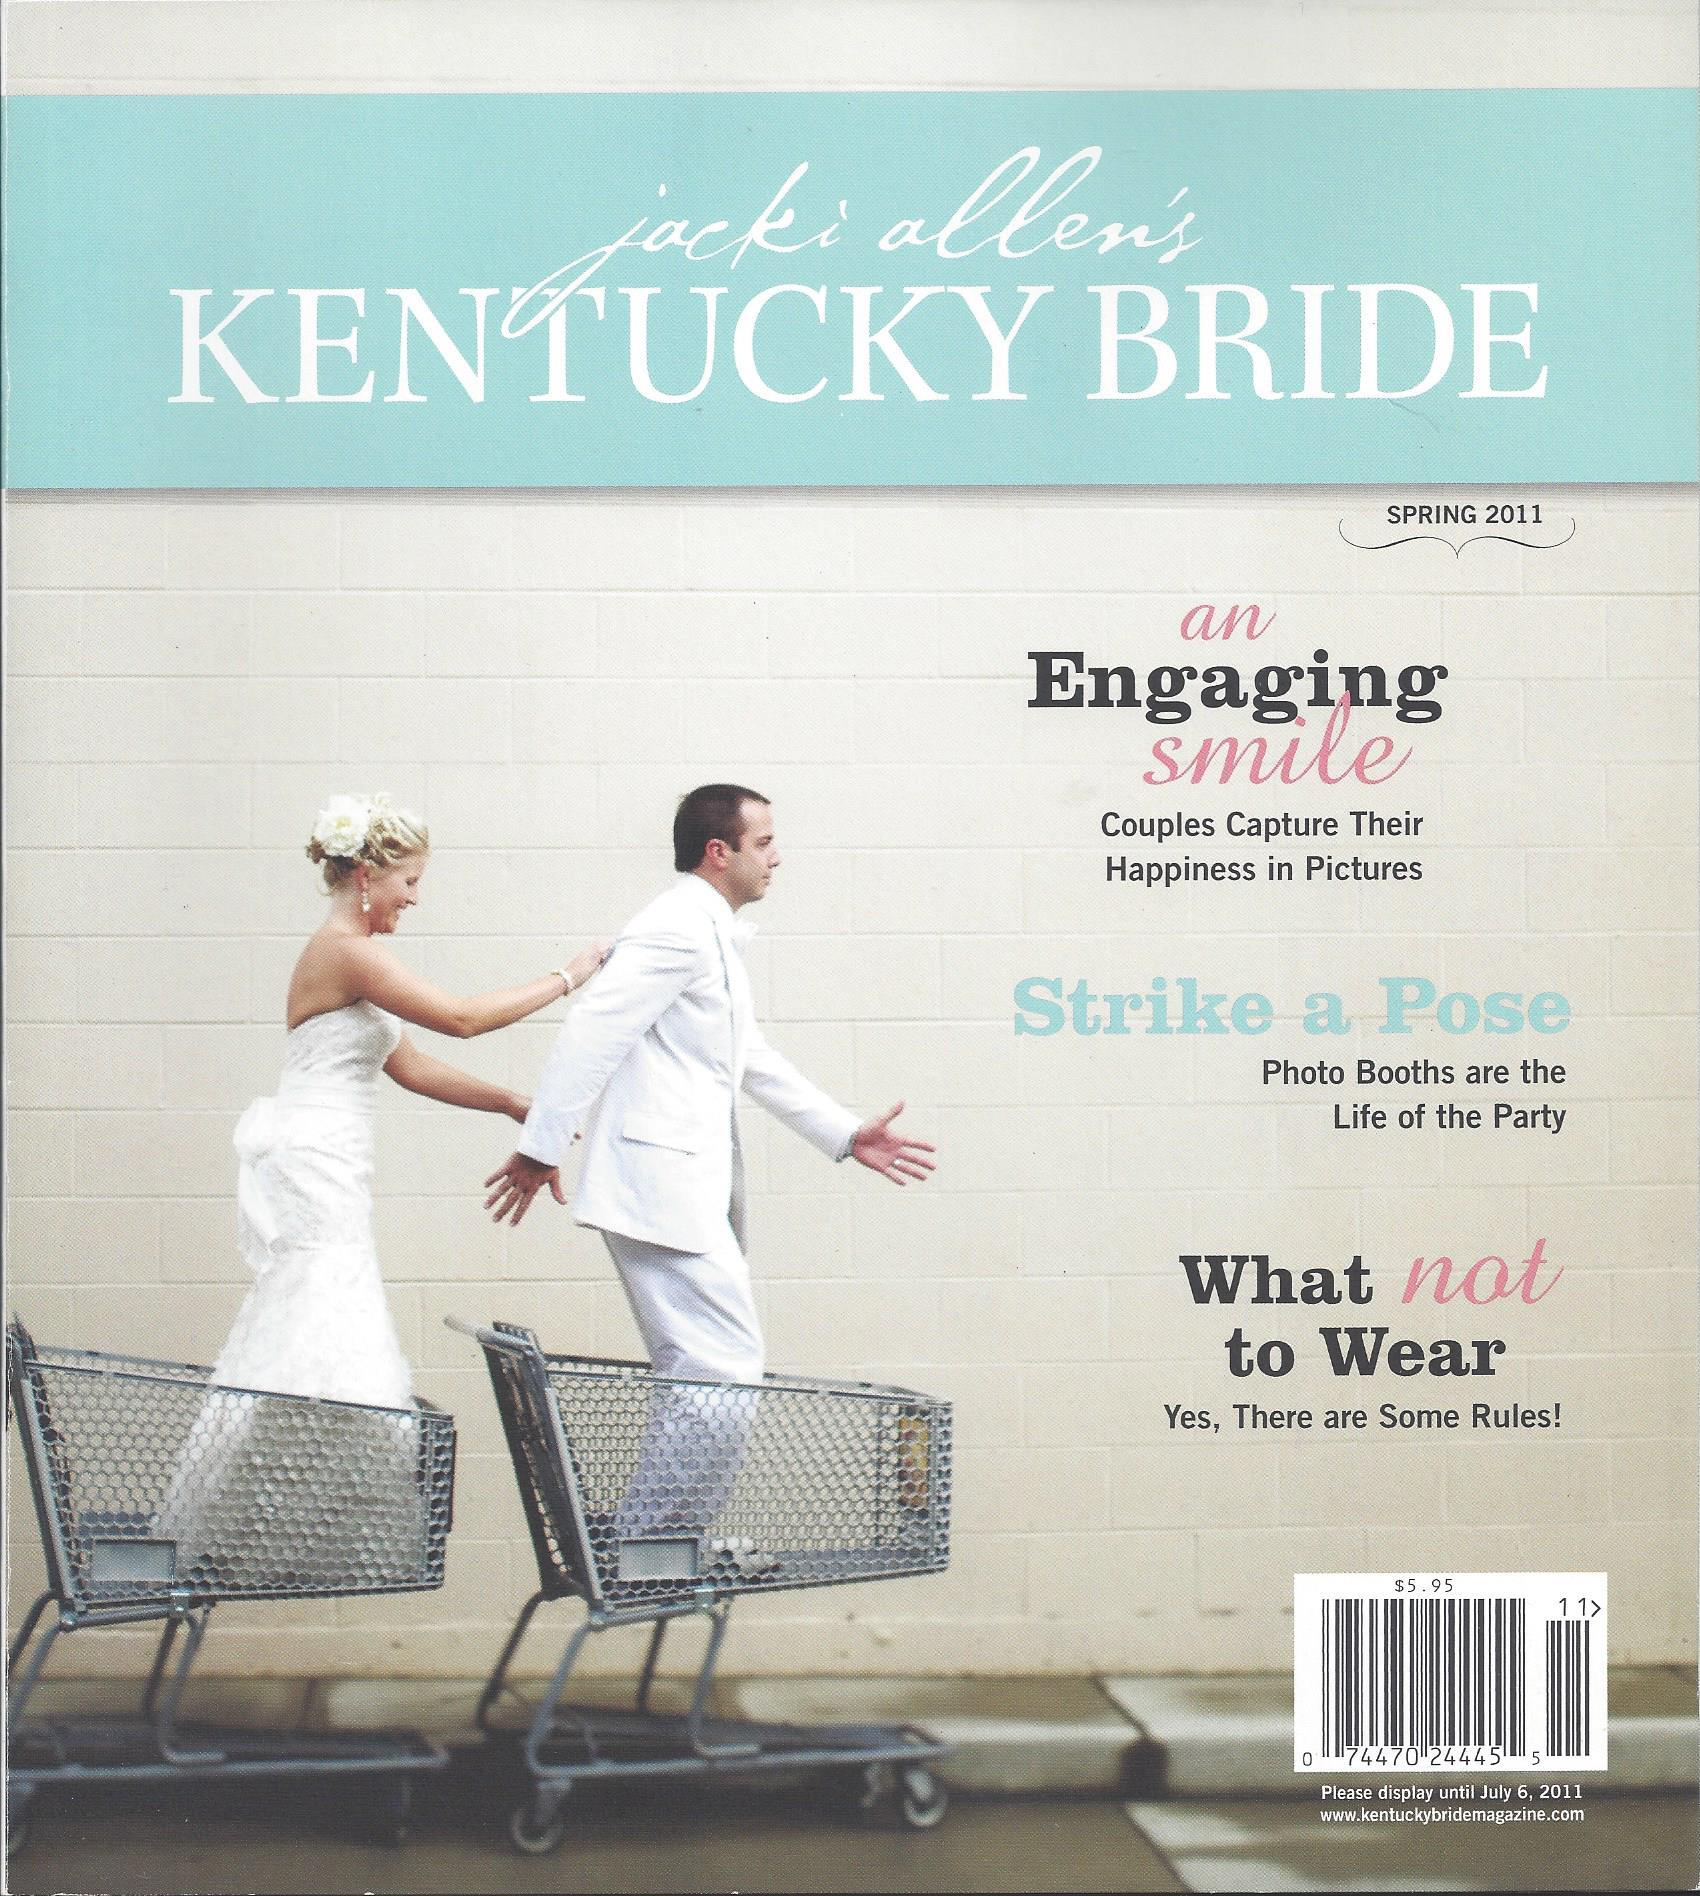 KentuckyBrideSpring2011_1.jpg